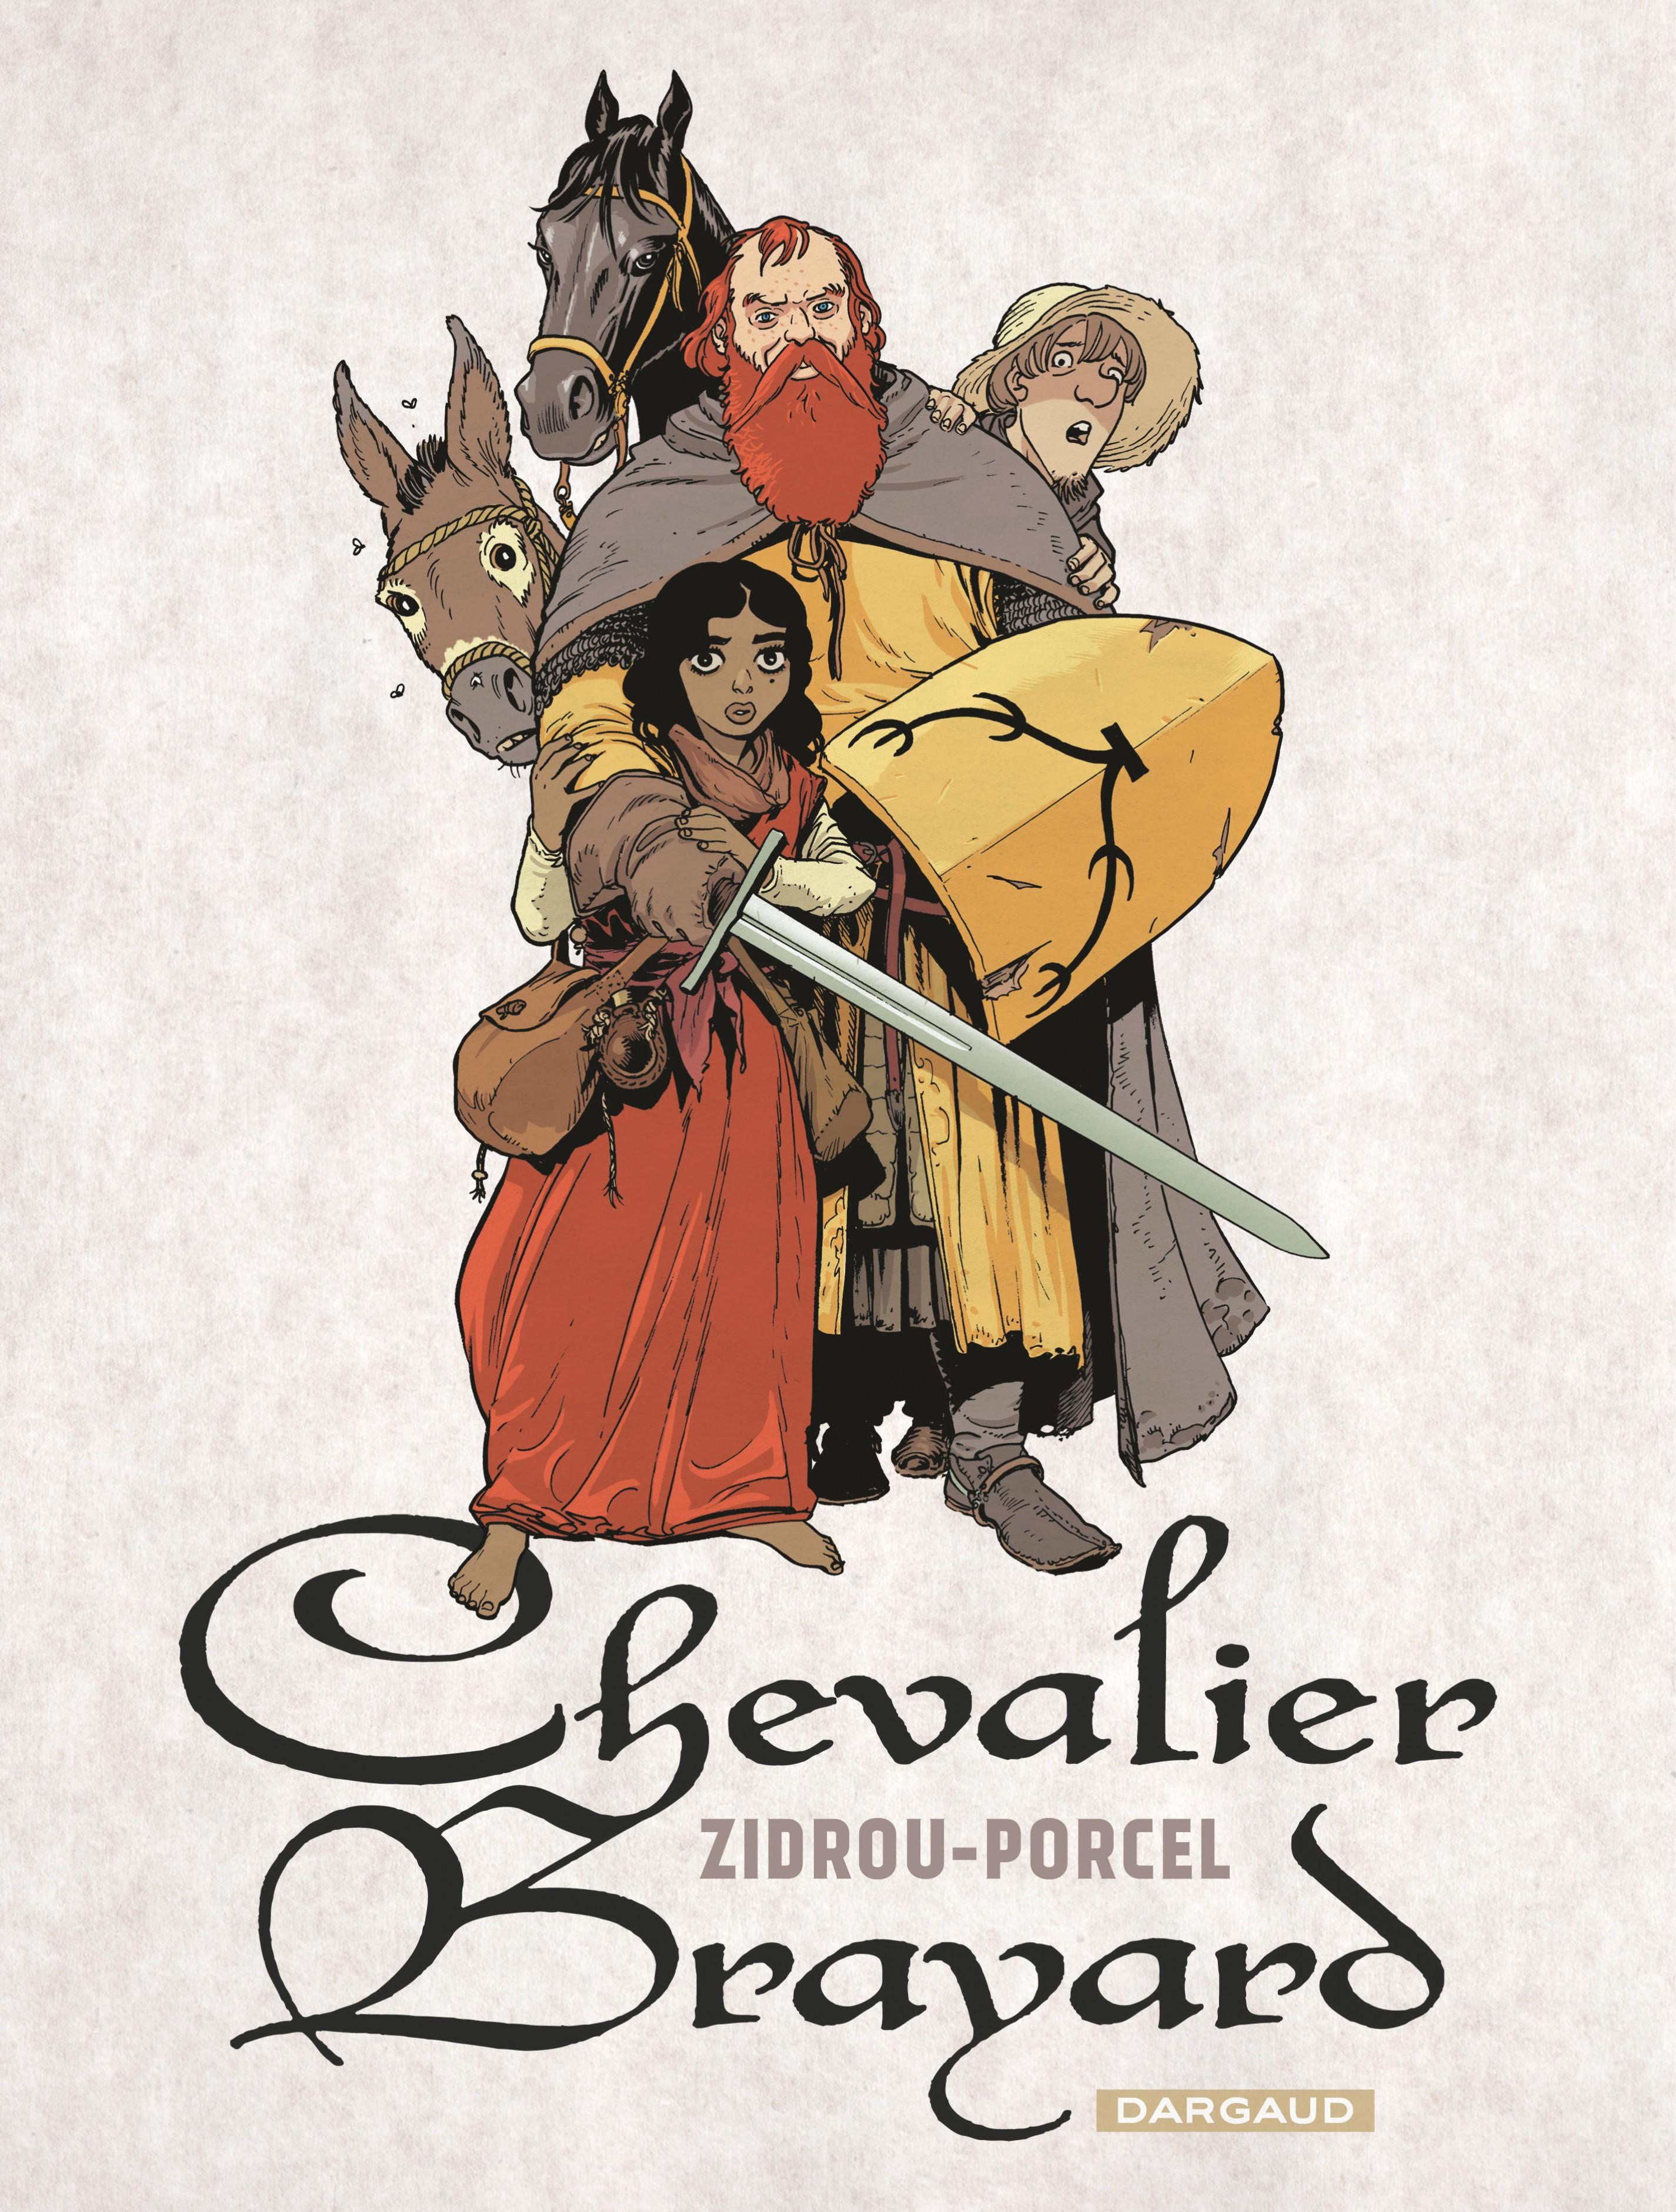 Chevalier Brayard - Chevalier Brayard - One-shot